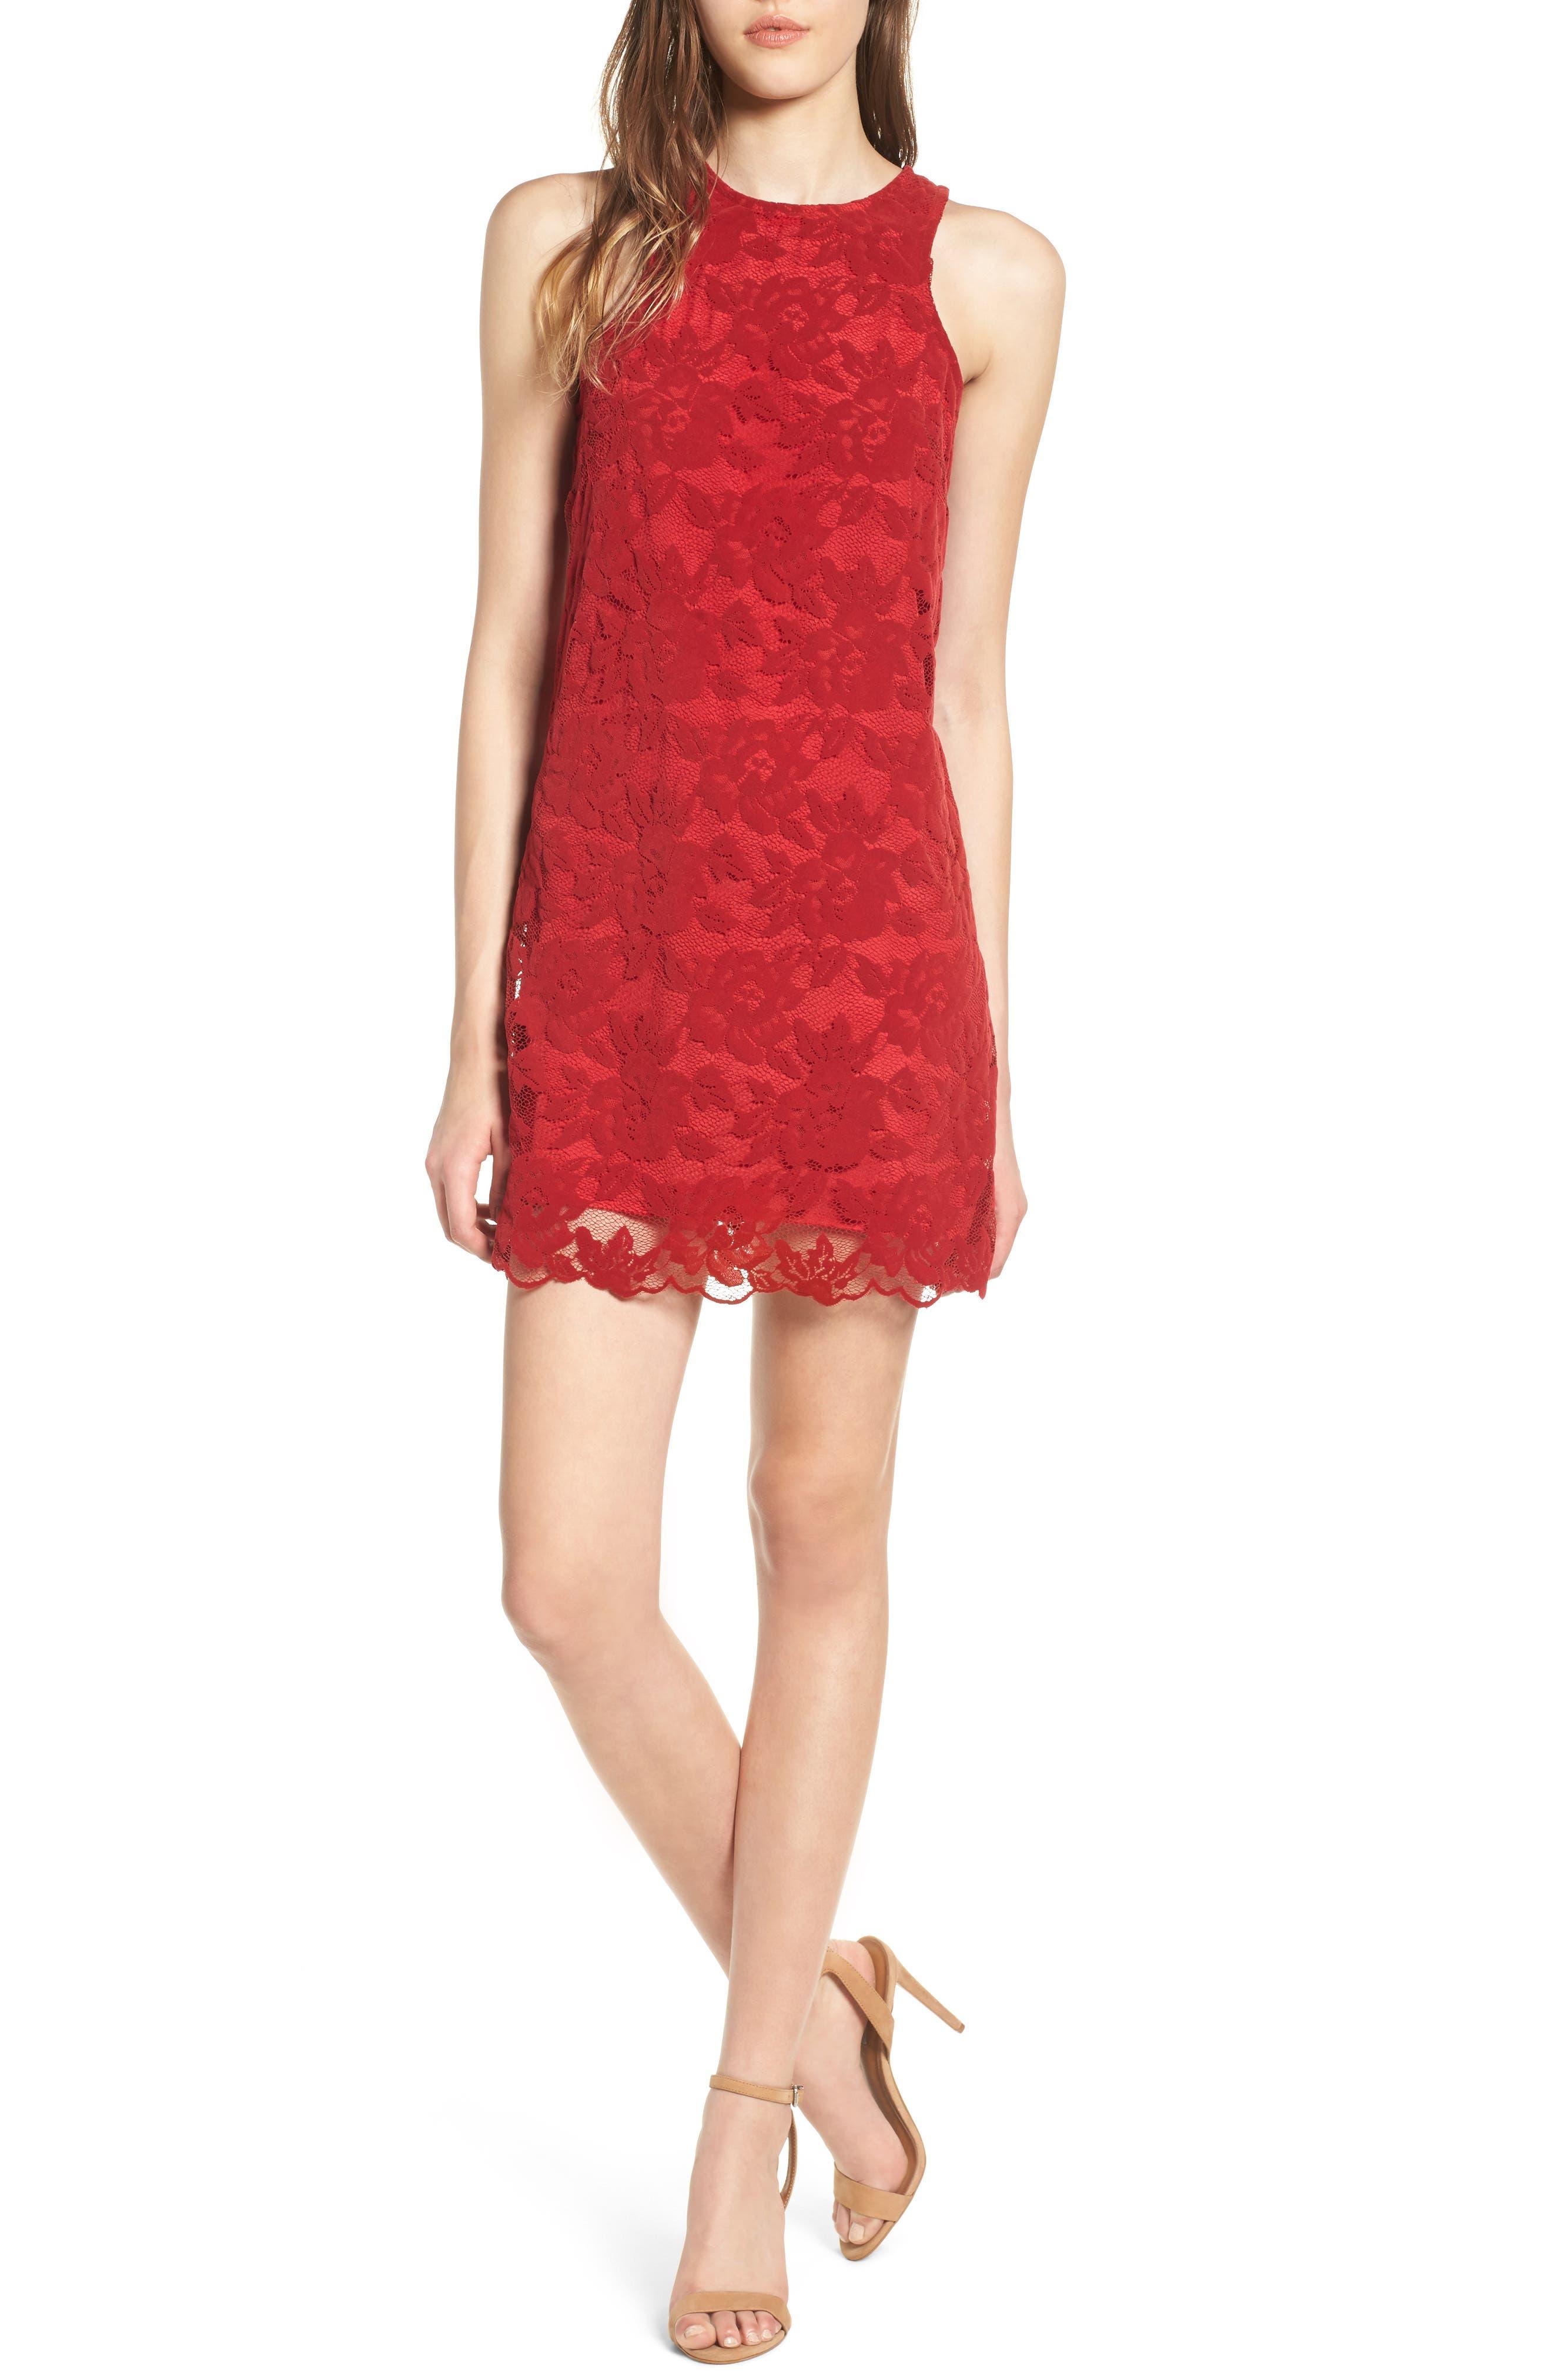 Main Image - Lovers + Friends Caspian Lace Sheath Dress